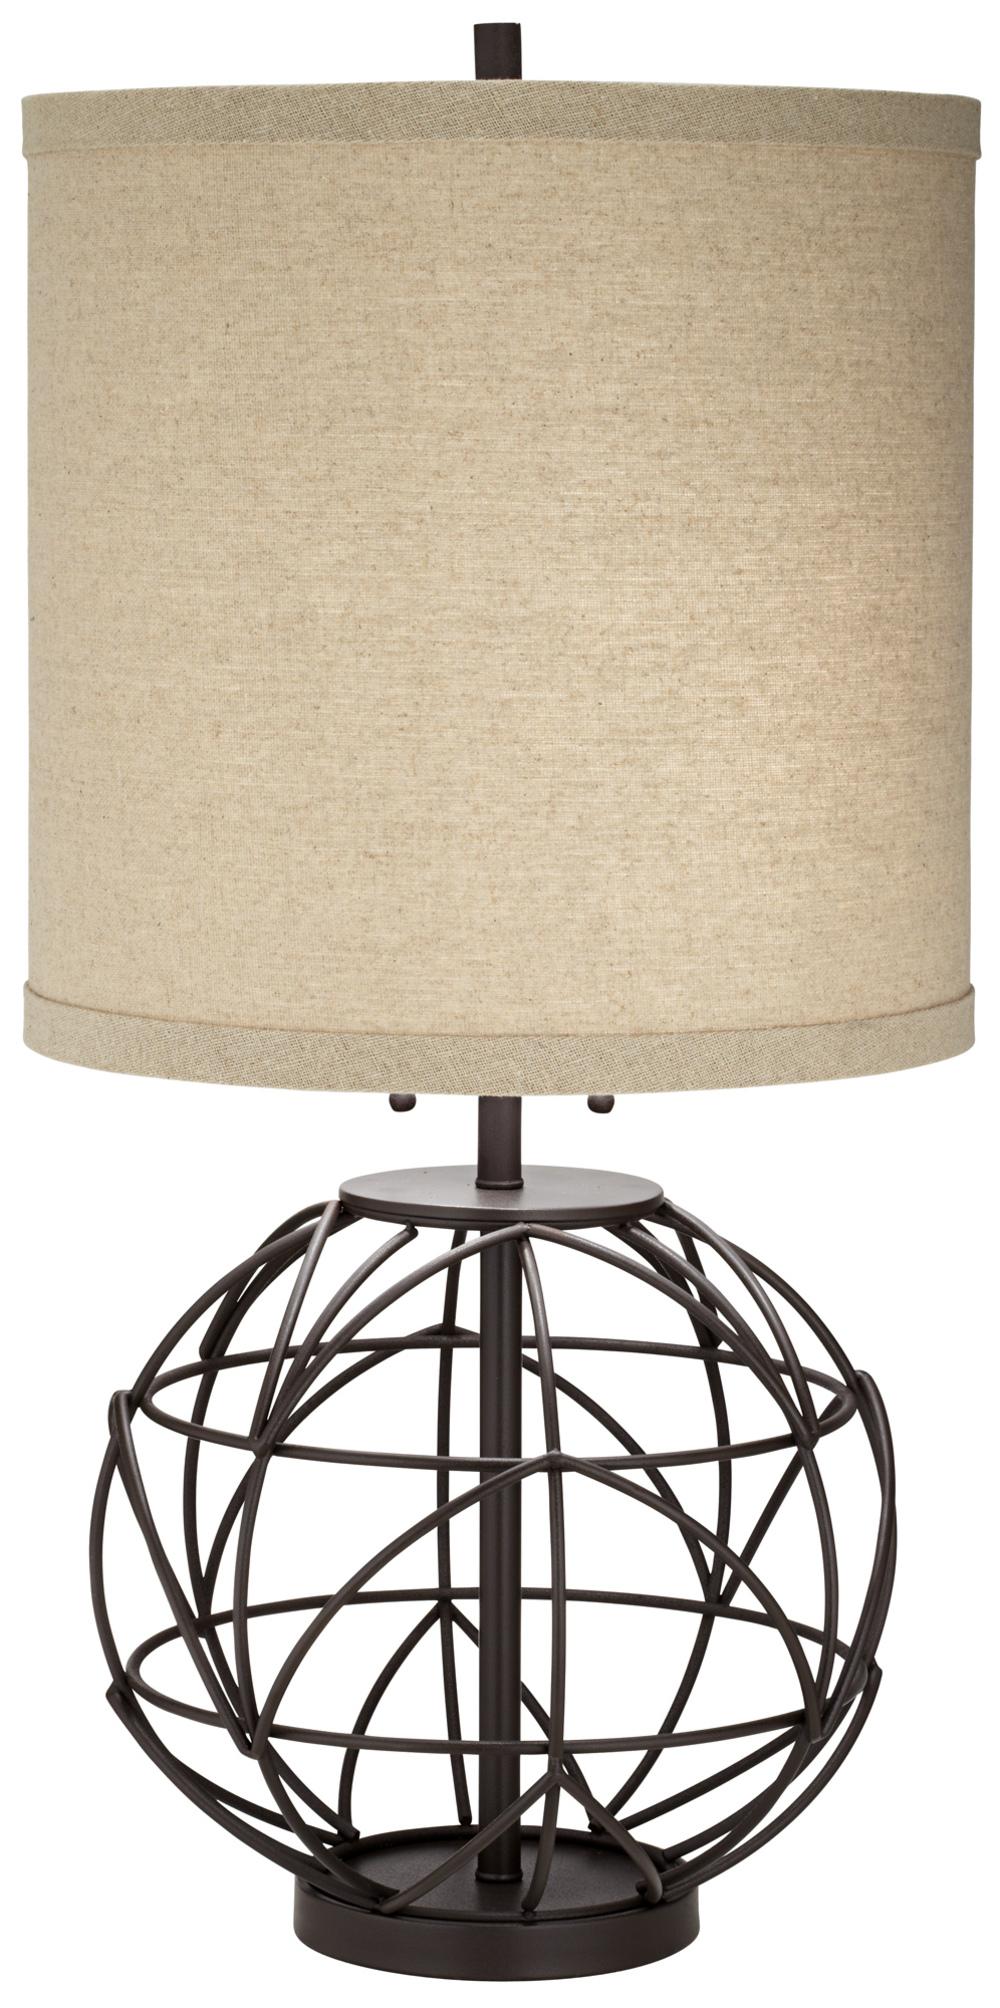 Pacific Coast Lighting - Alloy Globe Table Lamp